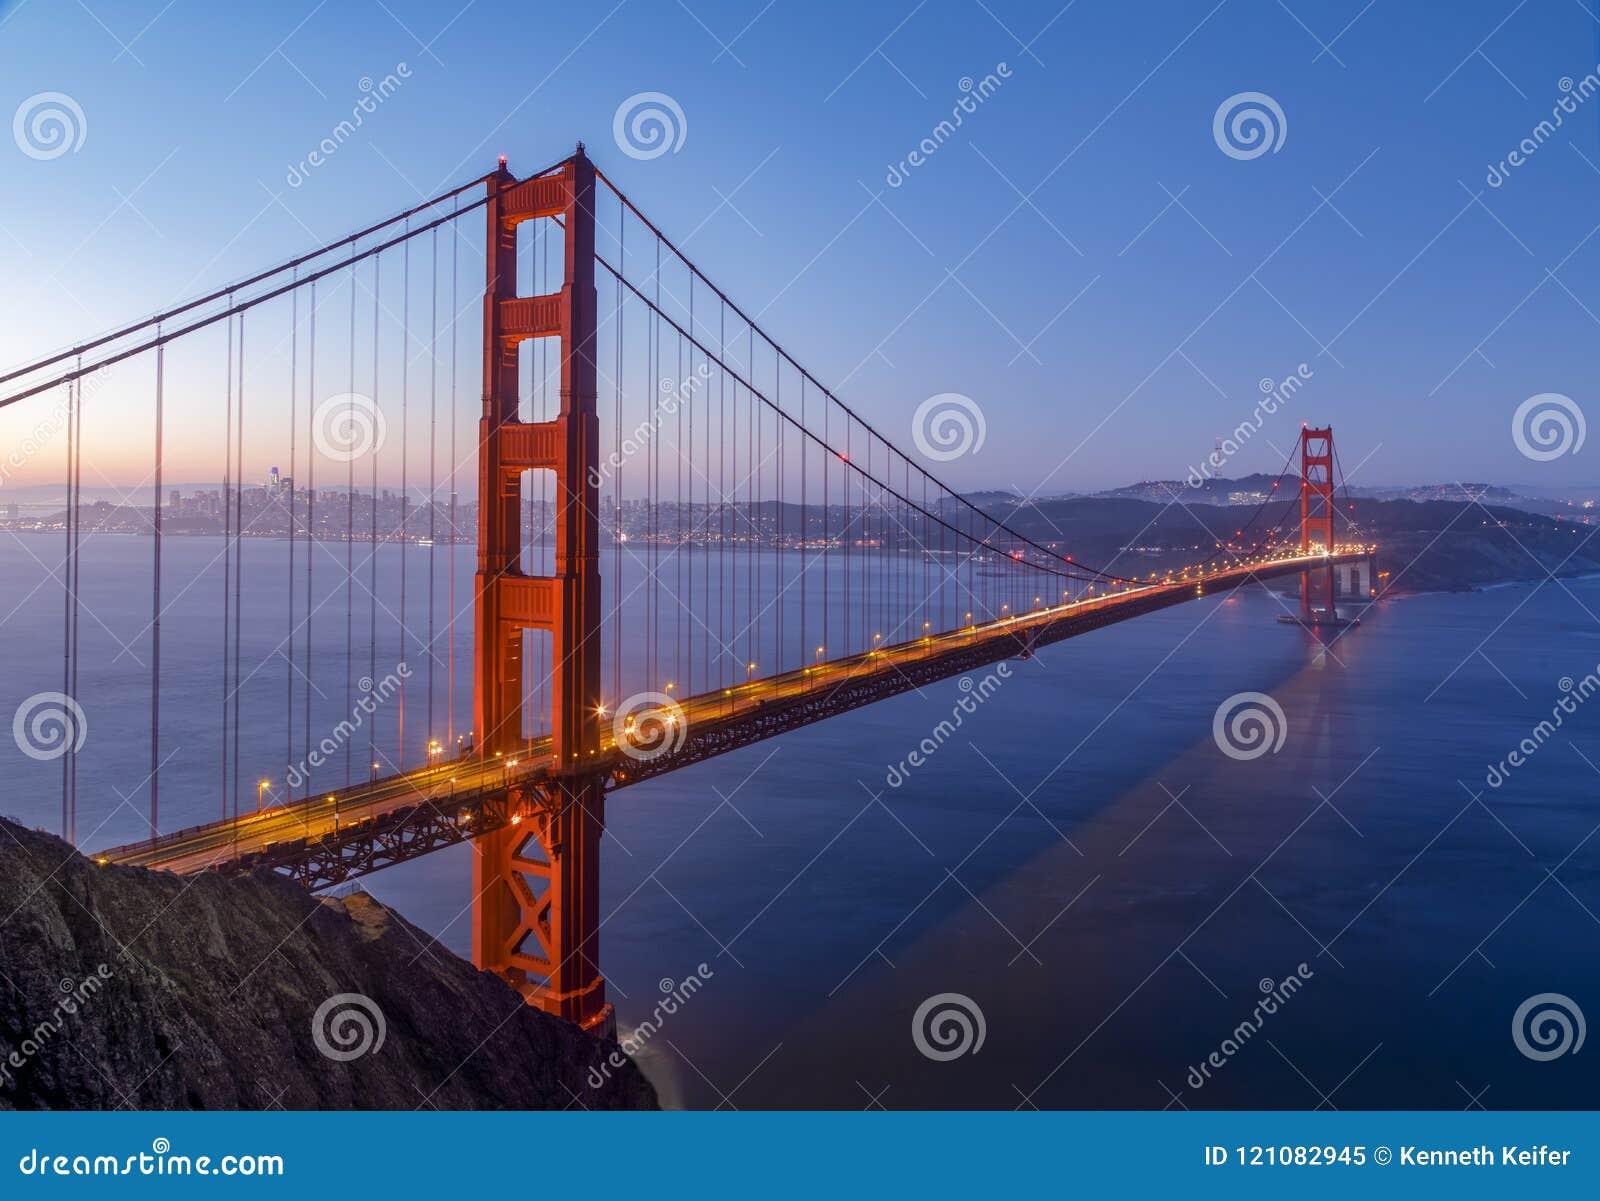 San Francisco Bay Daybreak - Golden gate bridge